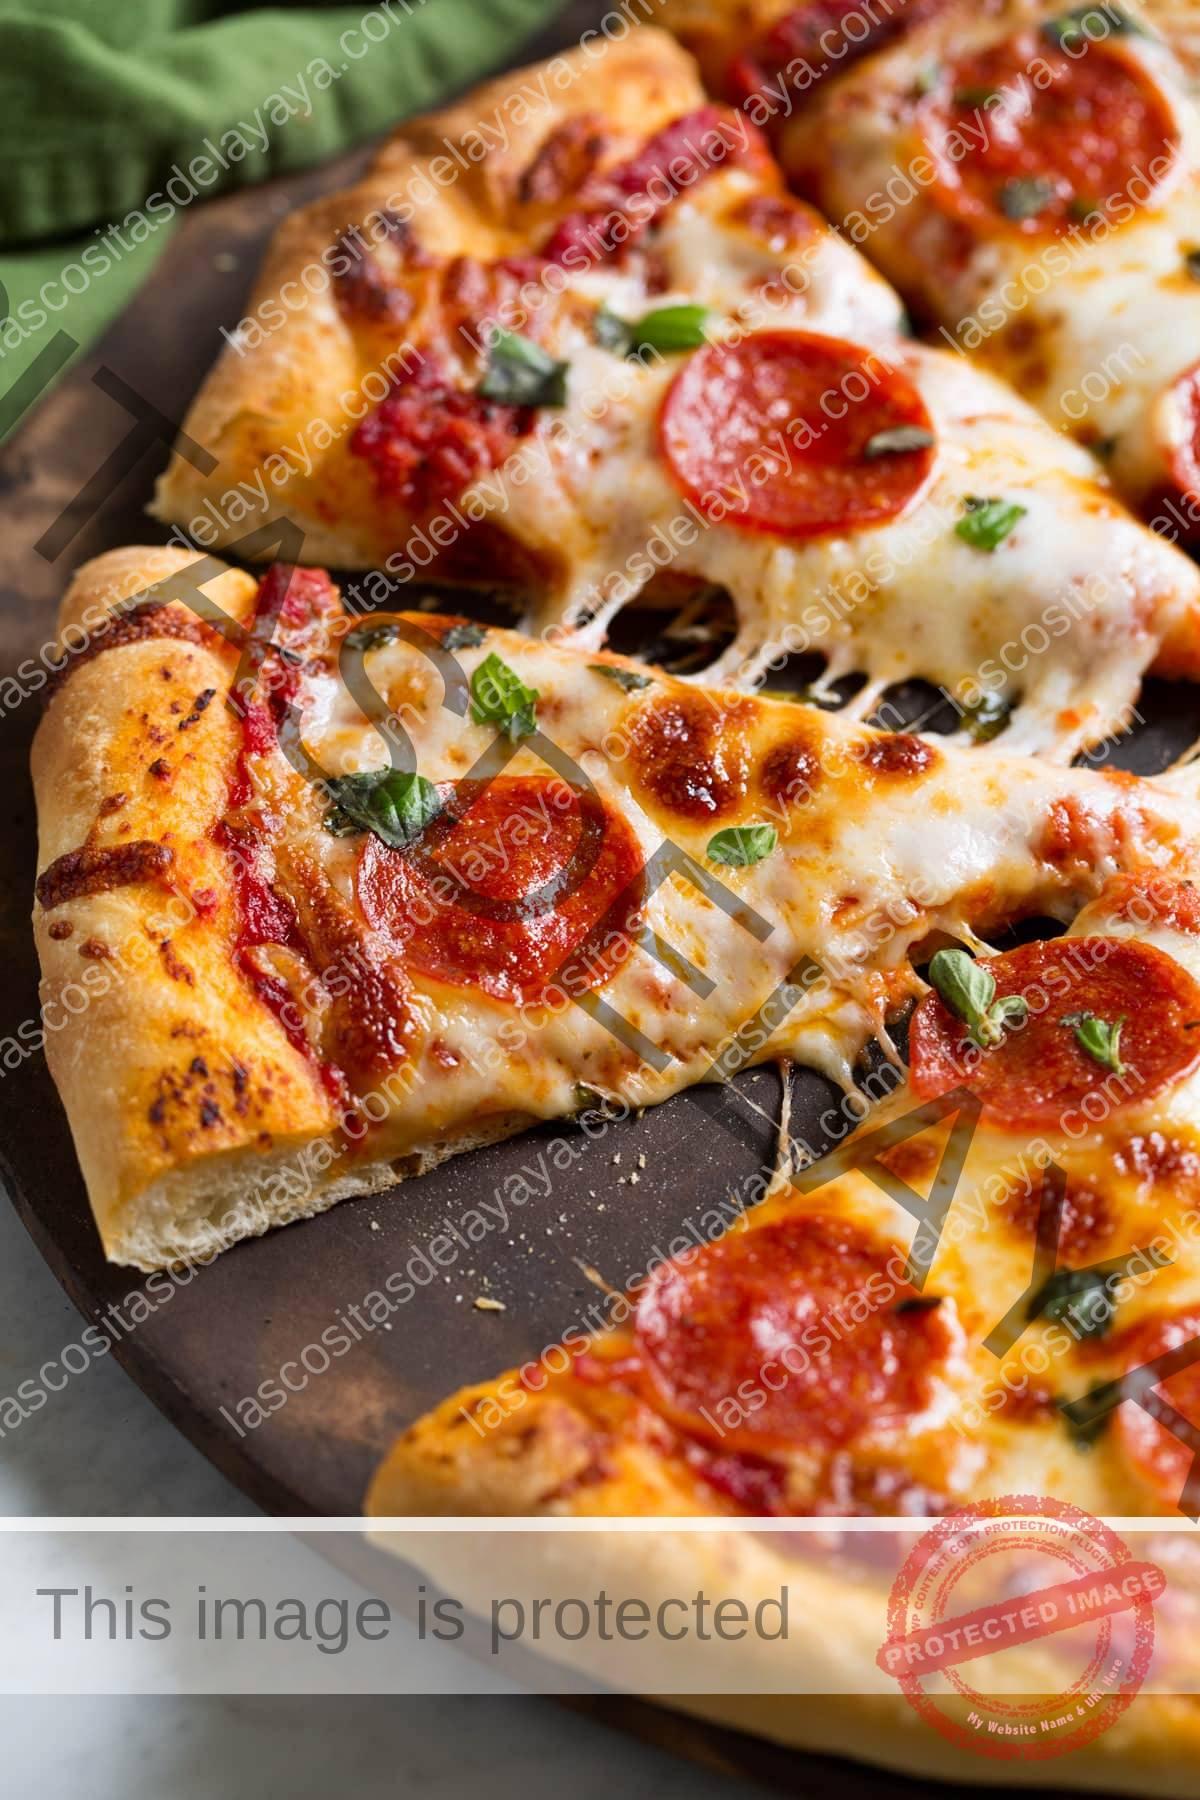 Fatias de pizza de calabresa feita com receita de massa de pizza caseira.